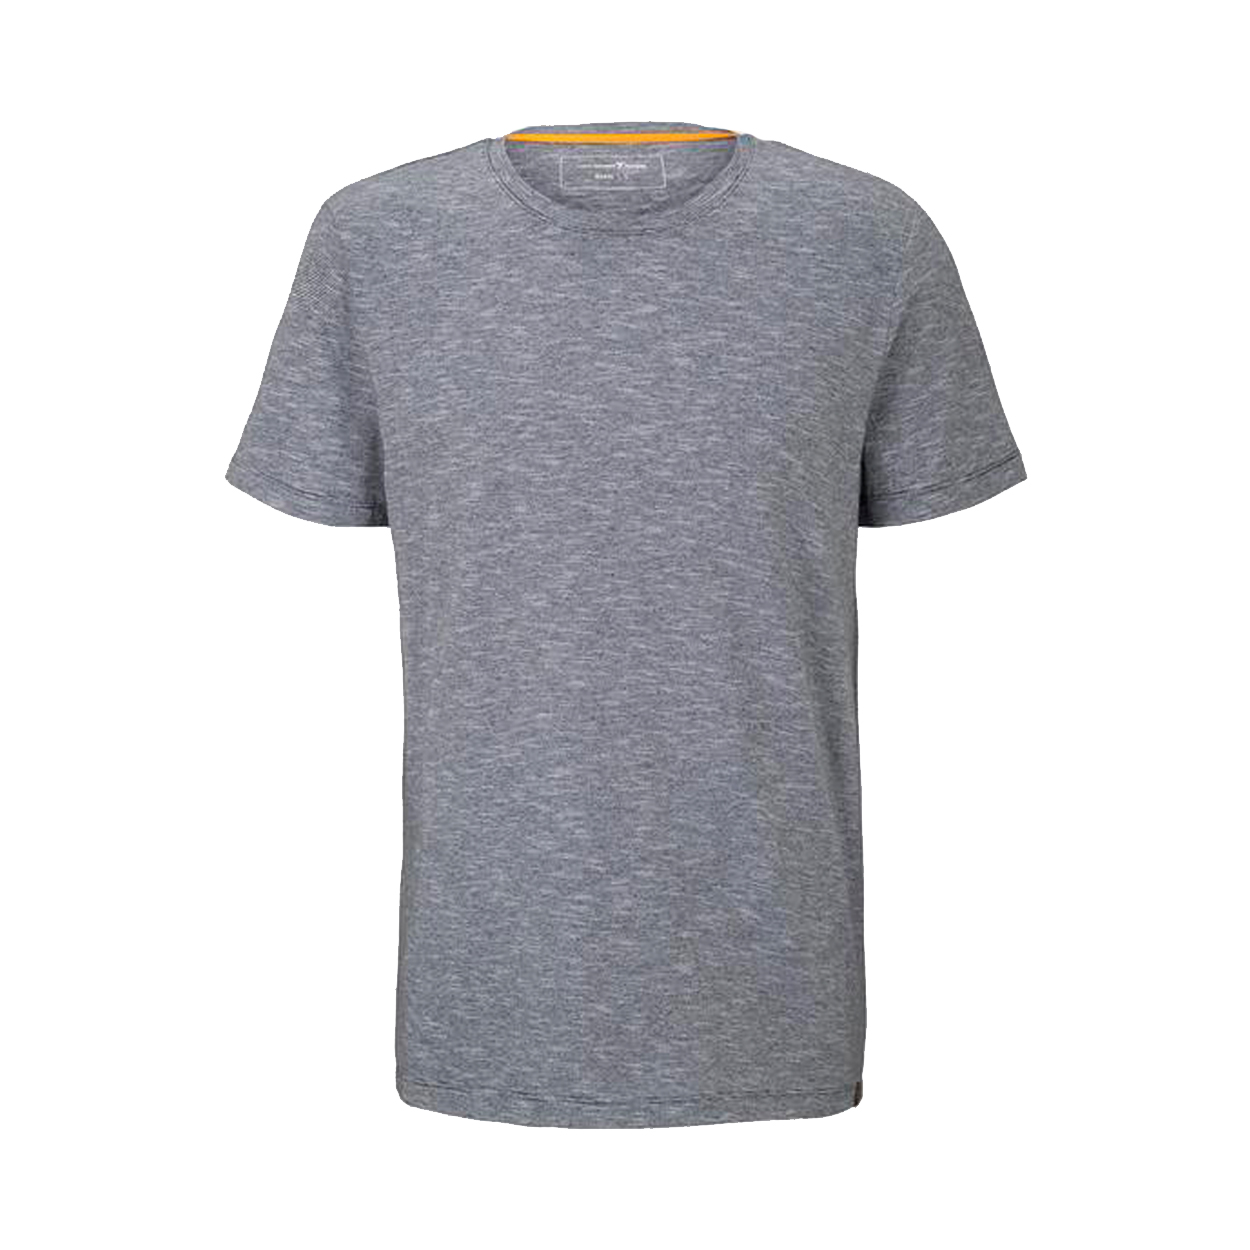 Tee-shirt col rond  en coton bleu ciel à fines rayures